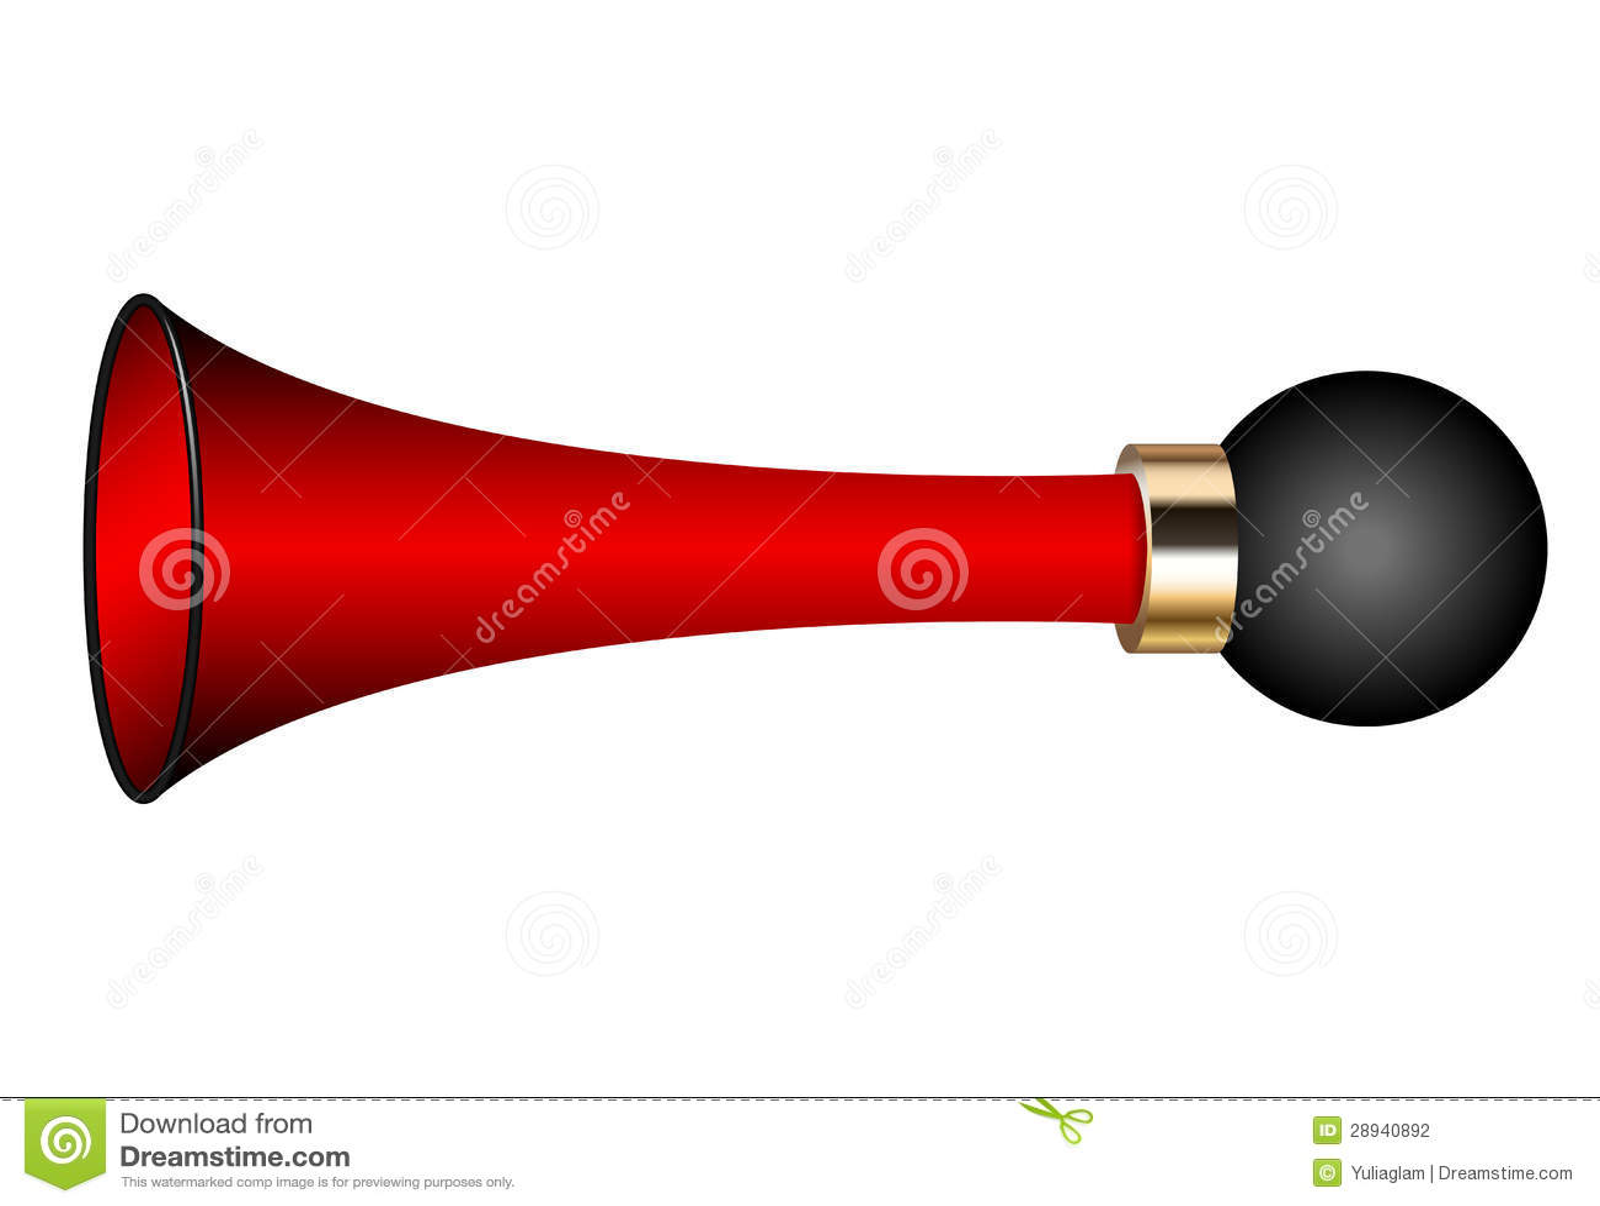 Loud Car Horn >> Air horn stock vector. Illustration of loud, metal, ring ...